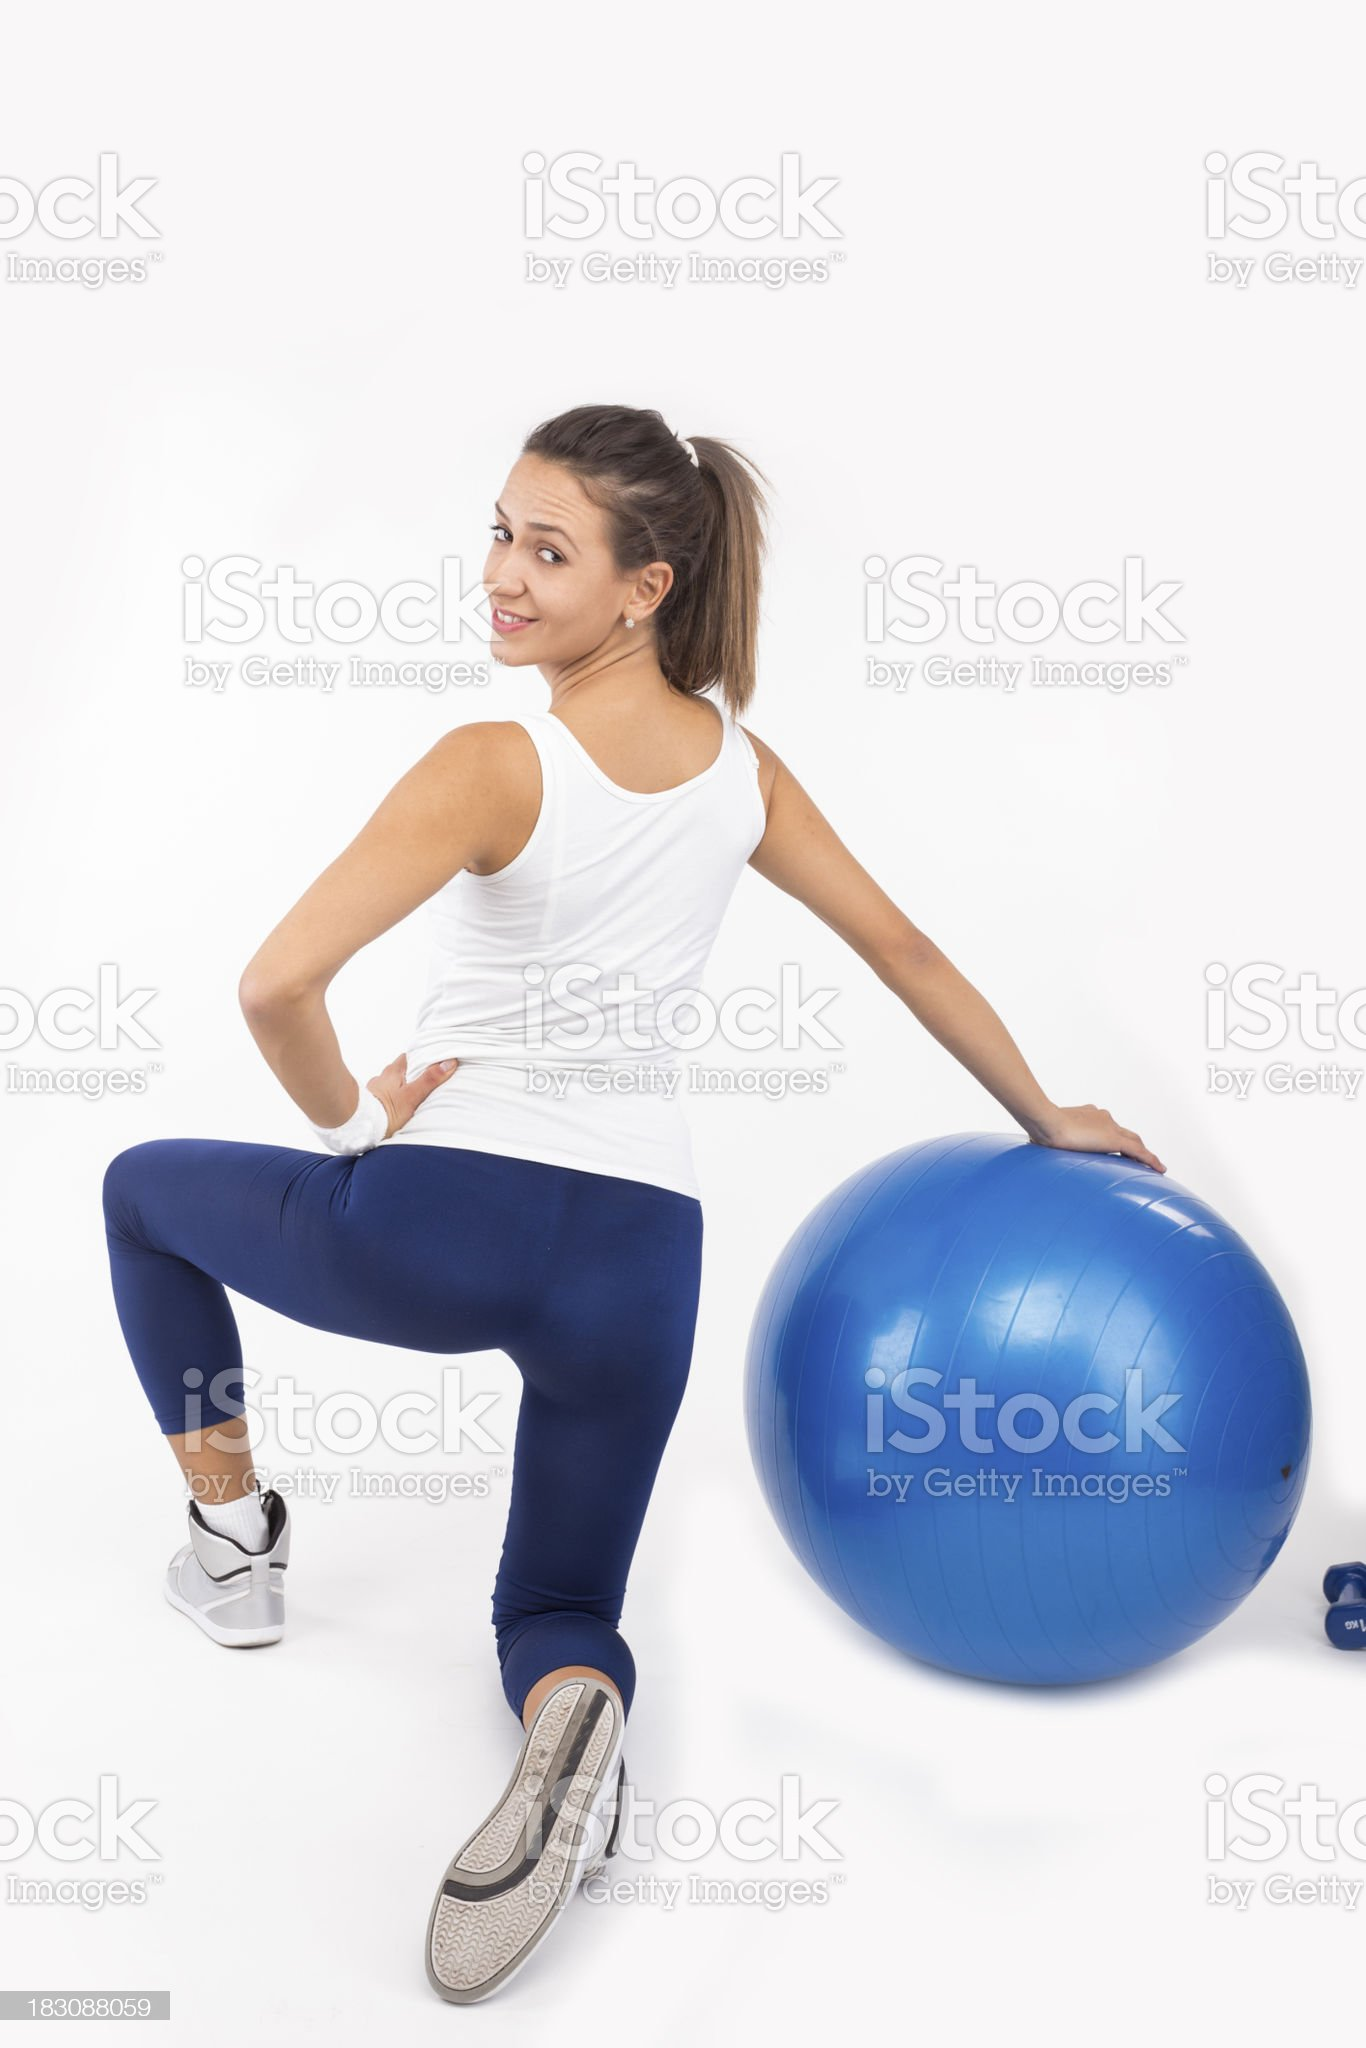 Sportswoman lunging royalty-free stock photo